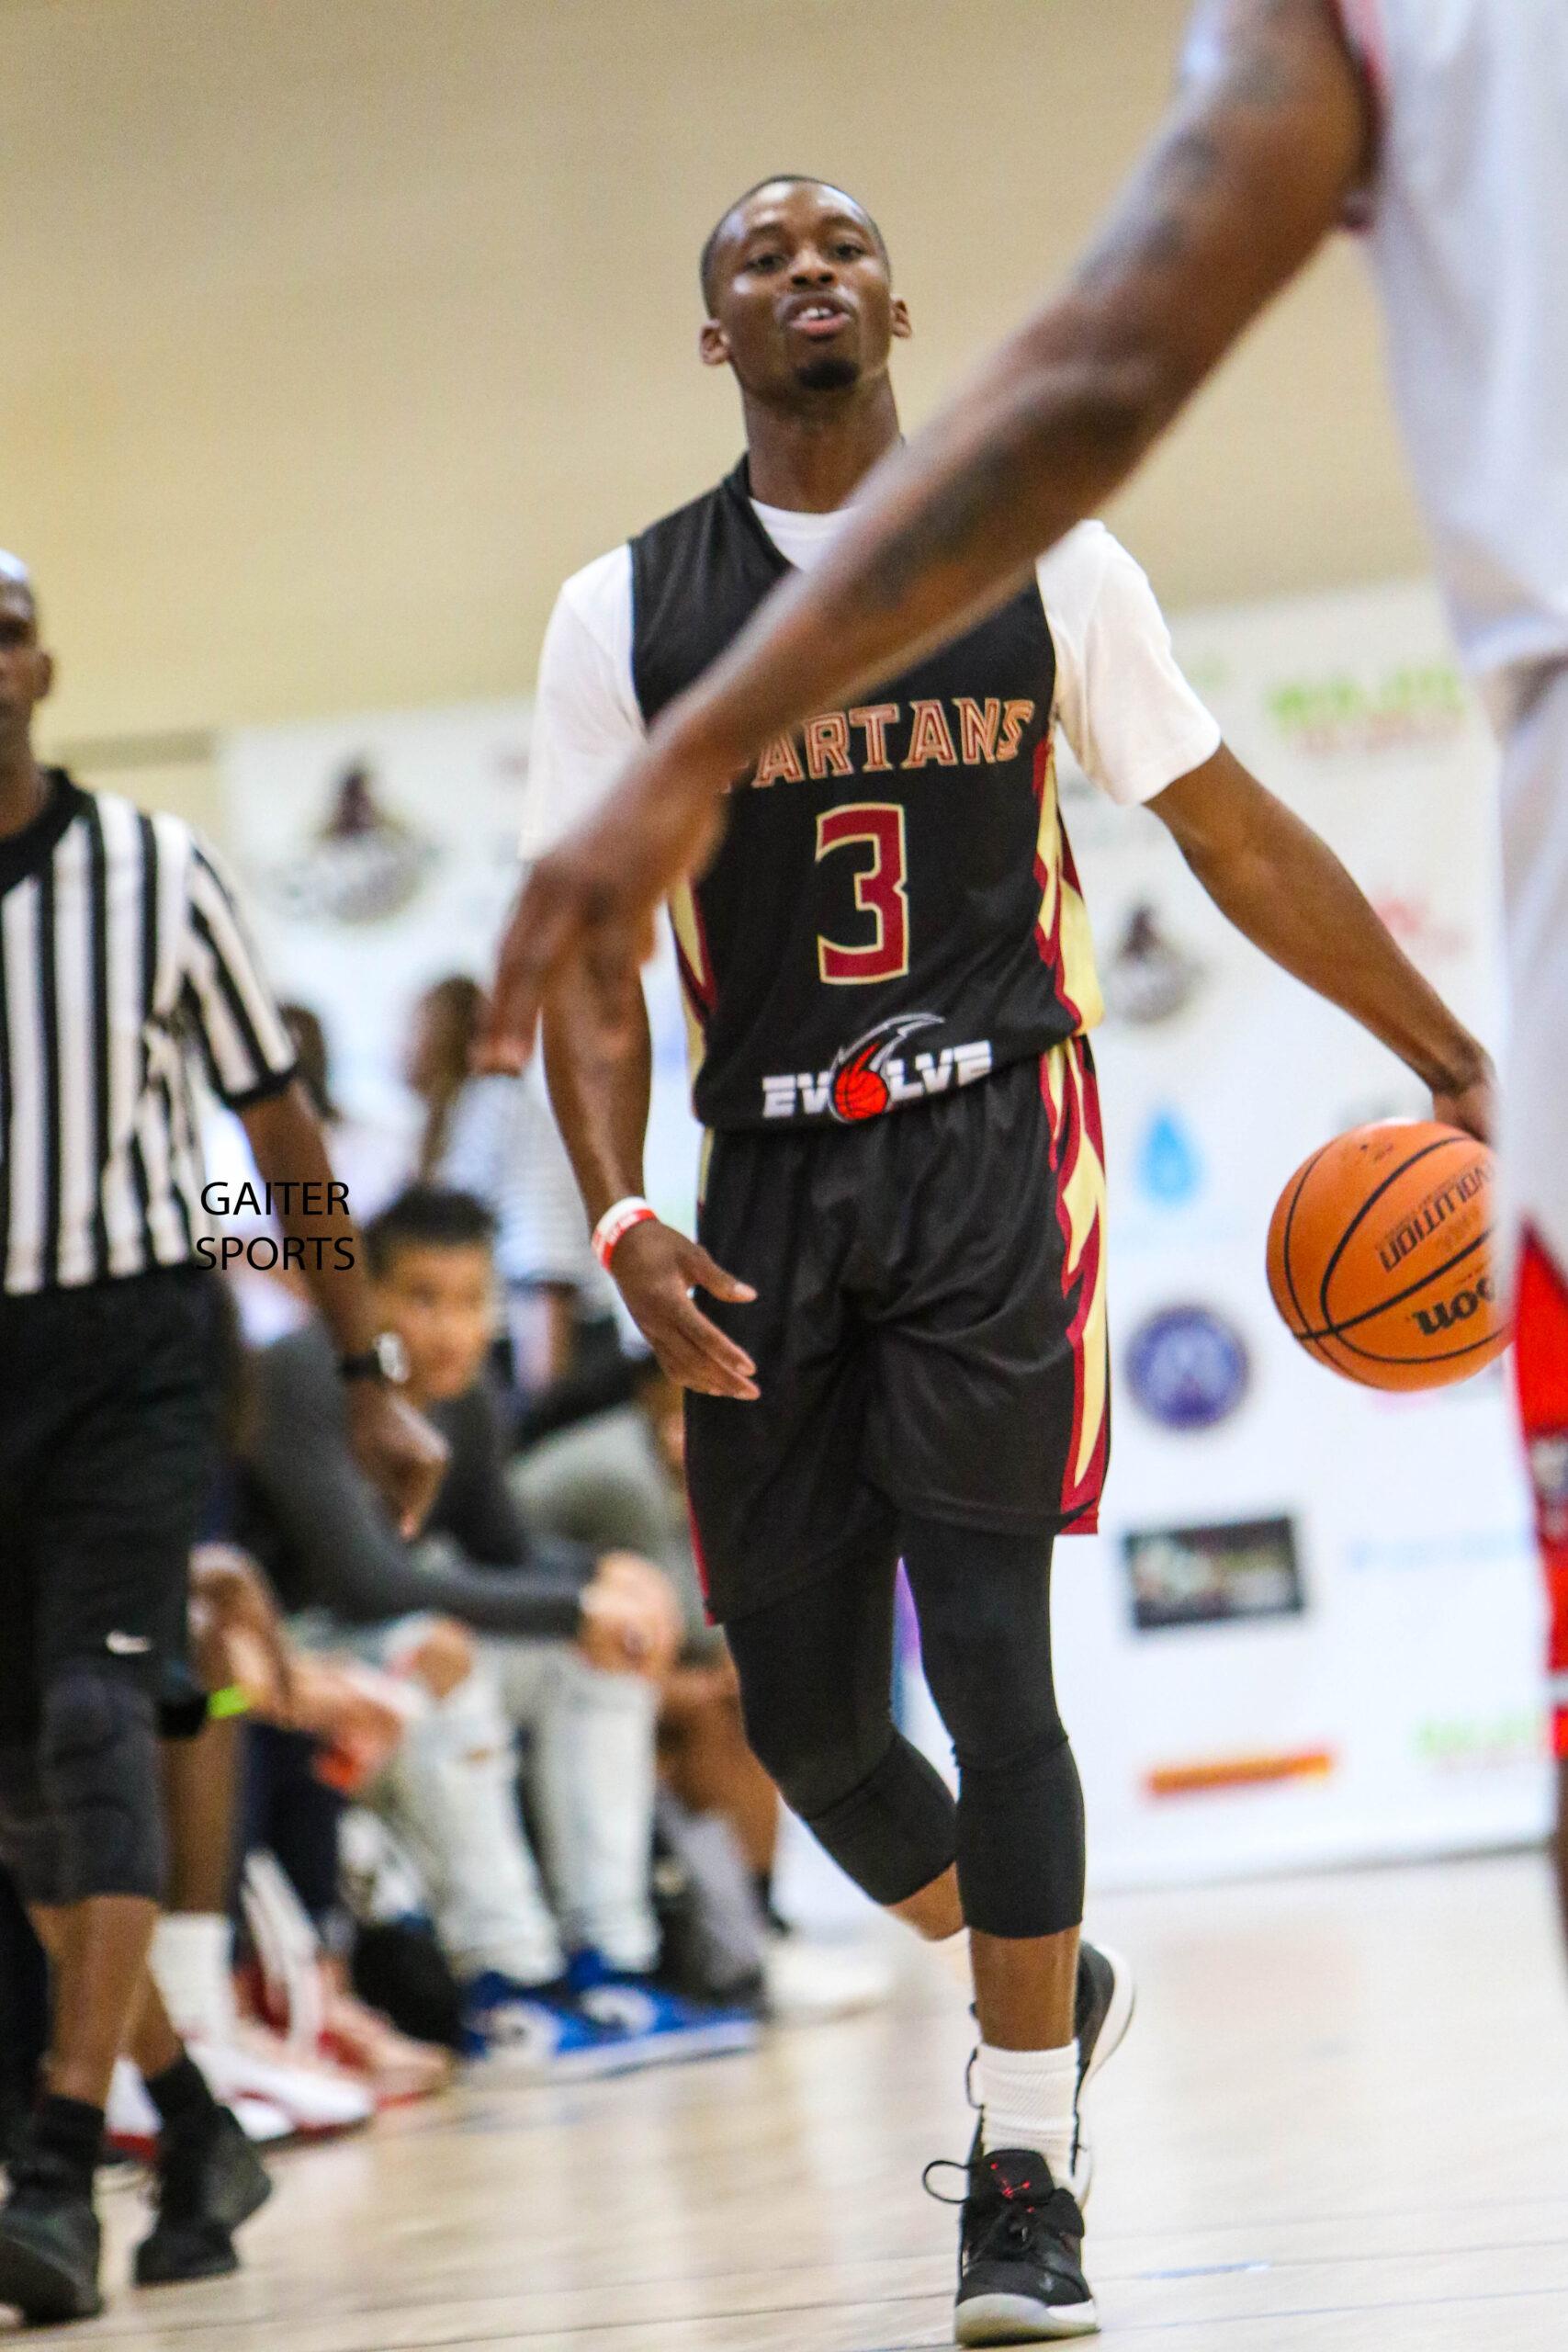 2019 Celebrity Basketball Game Georgia Spartans 10